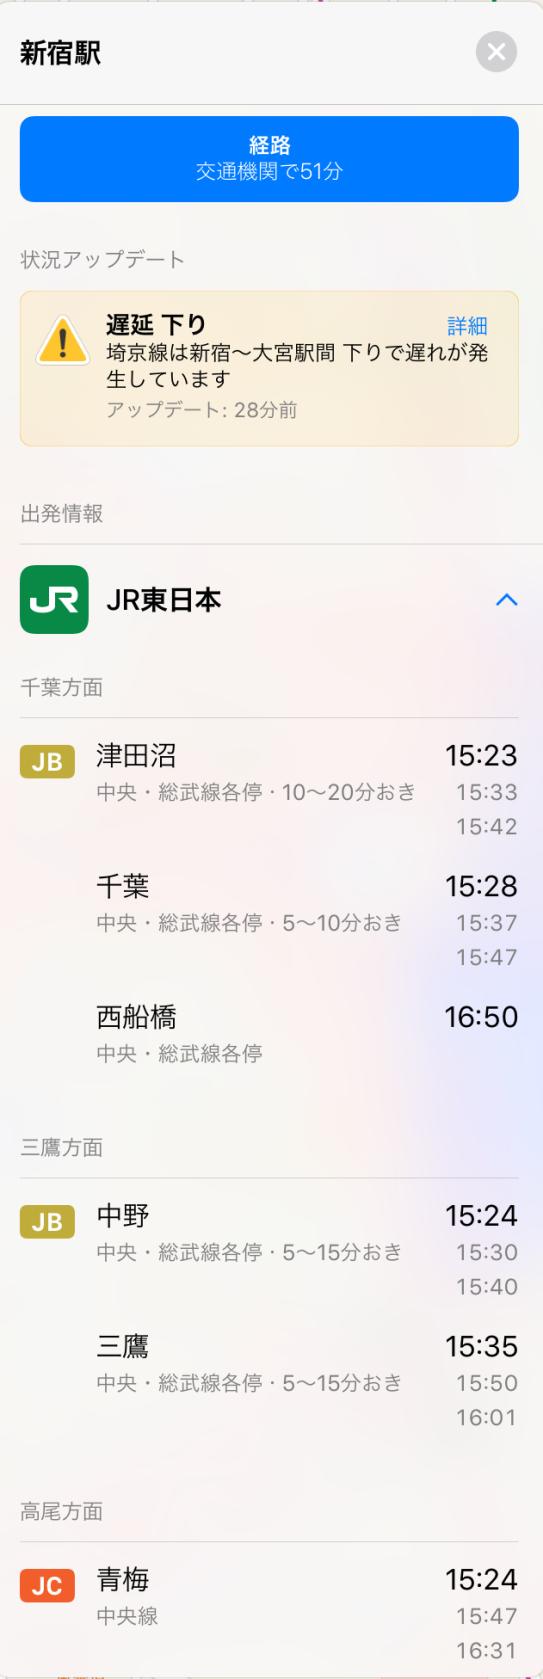 Shinjuku Station train line code rectangular icons May 25